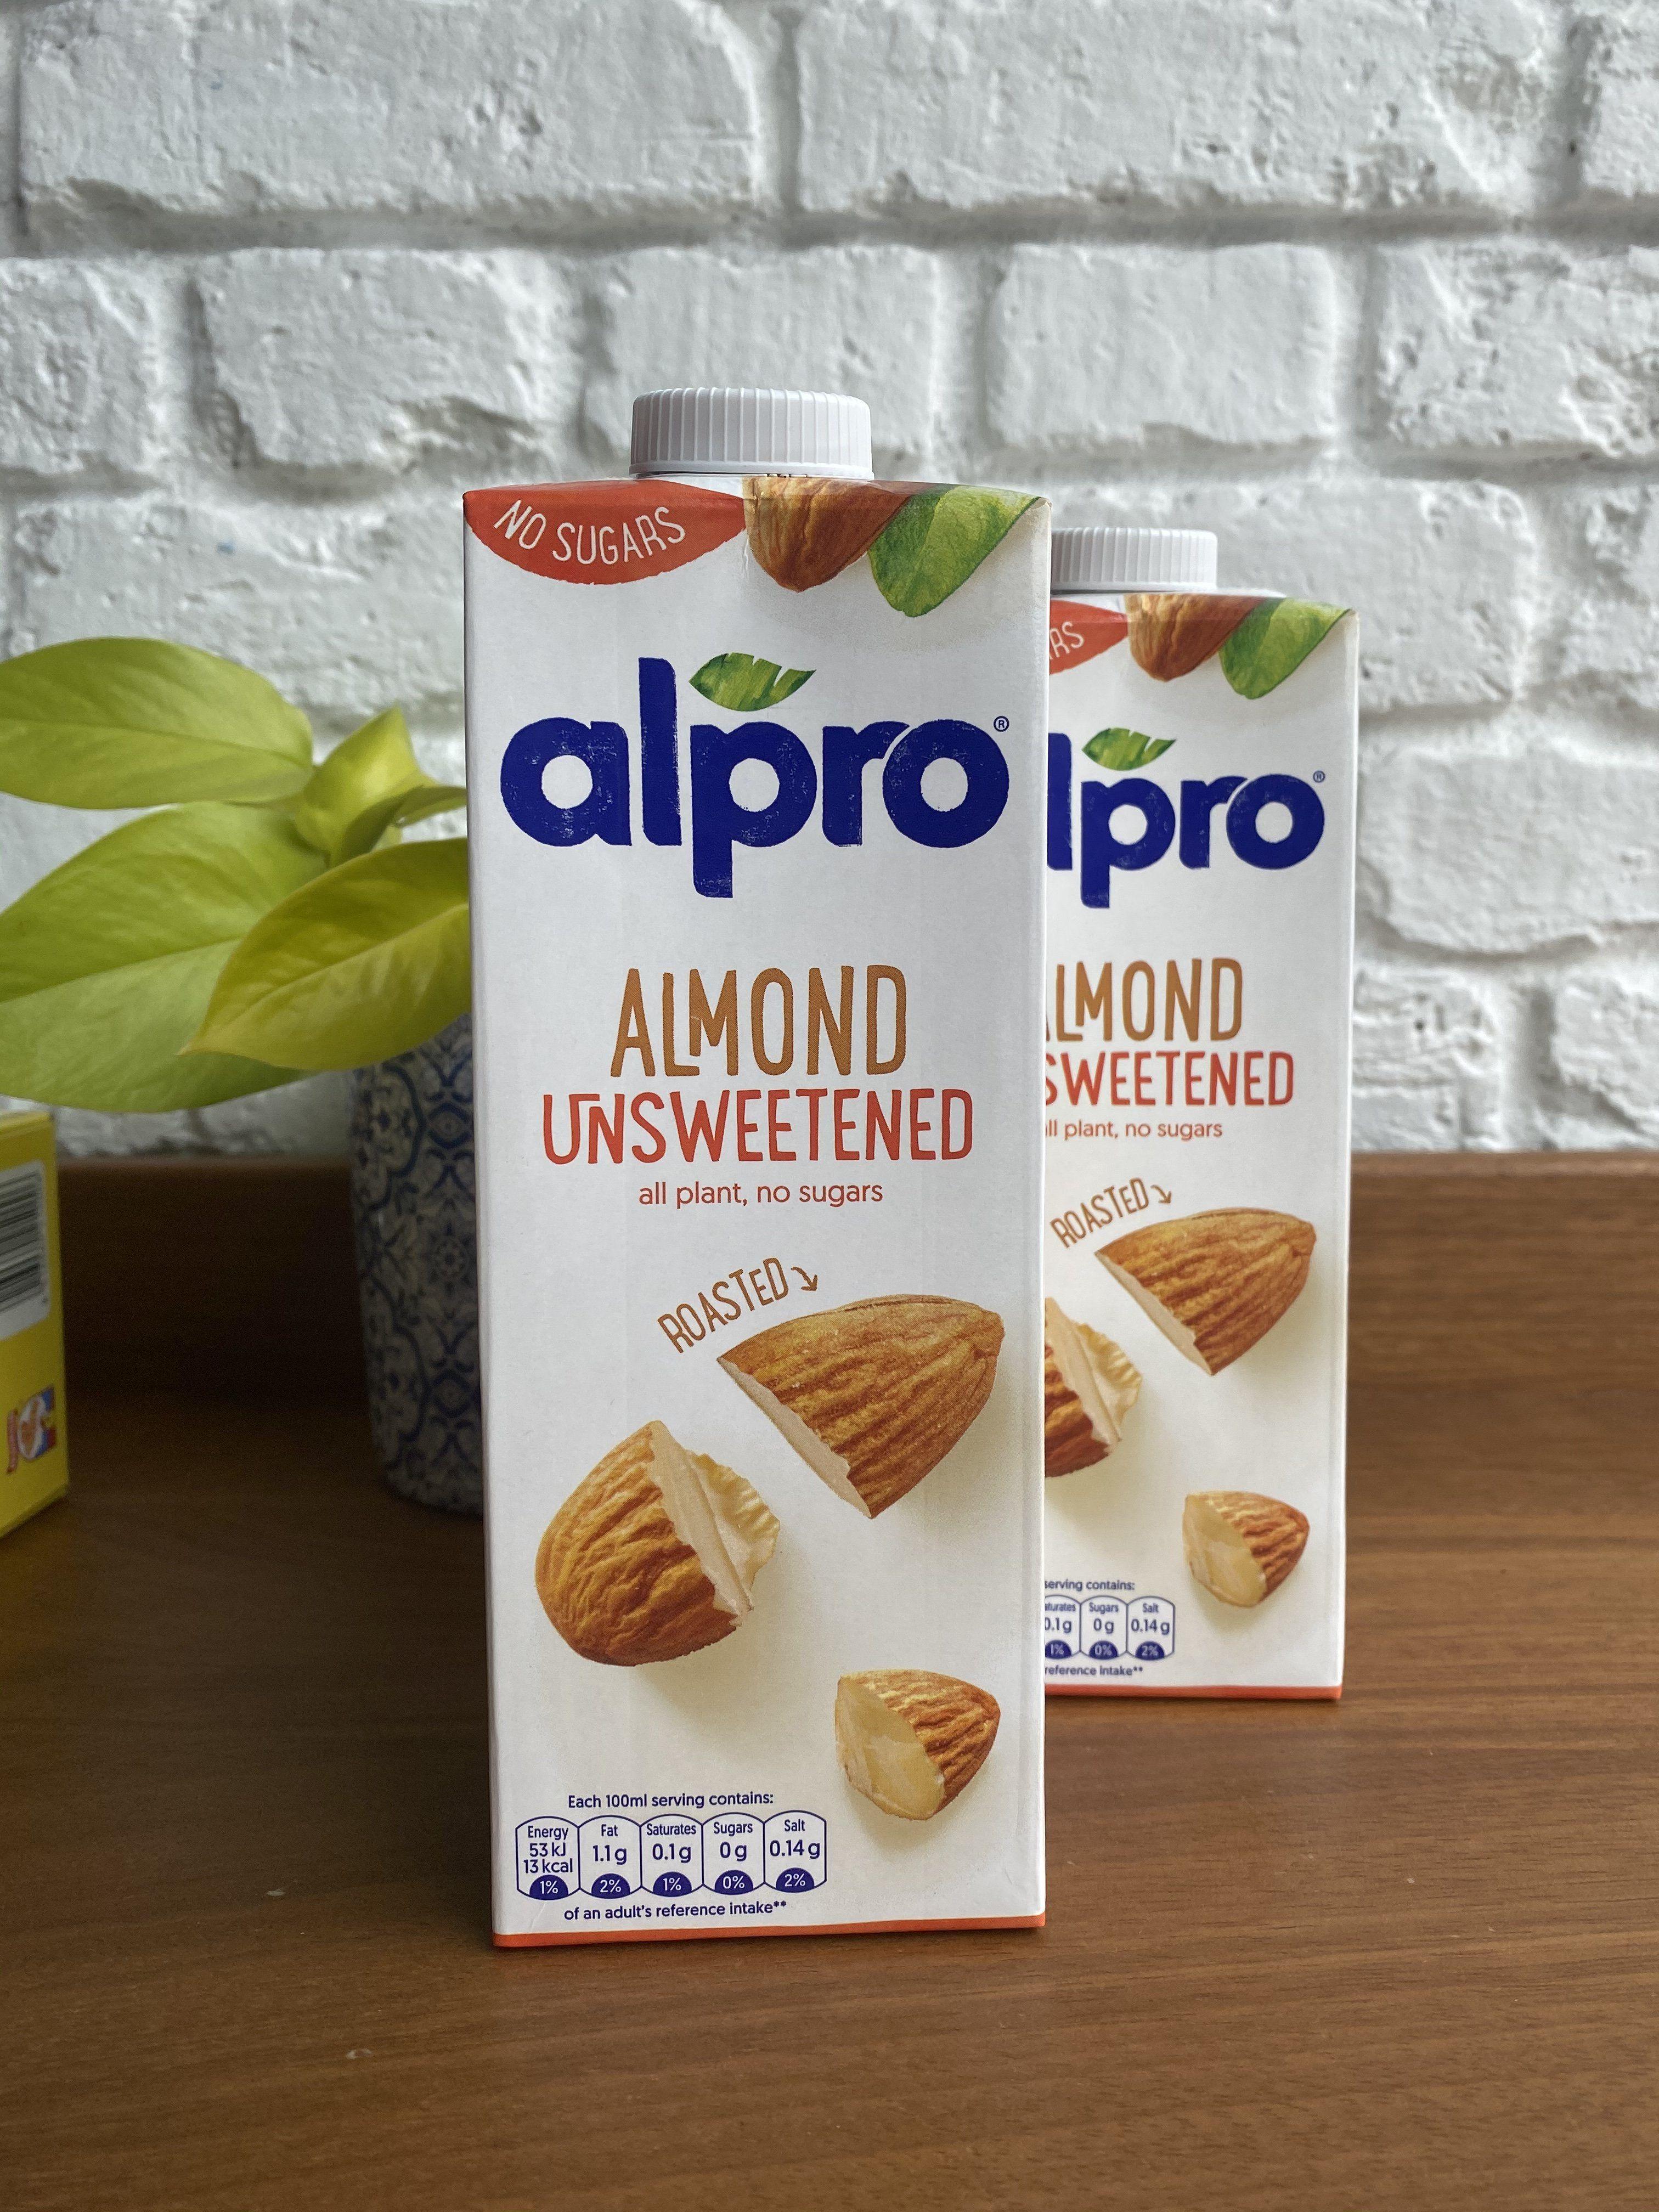 Almond milk (unsweetened) - 2 cartons